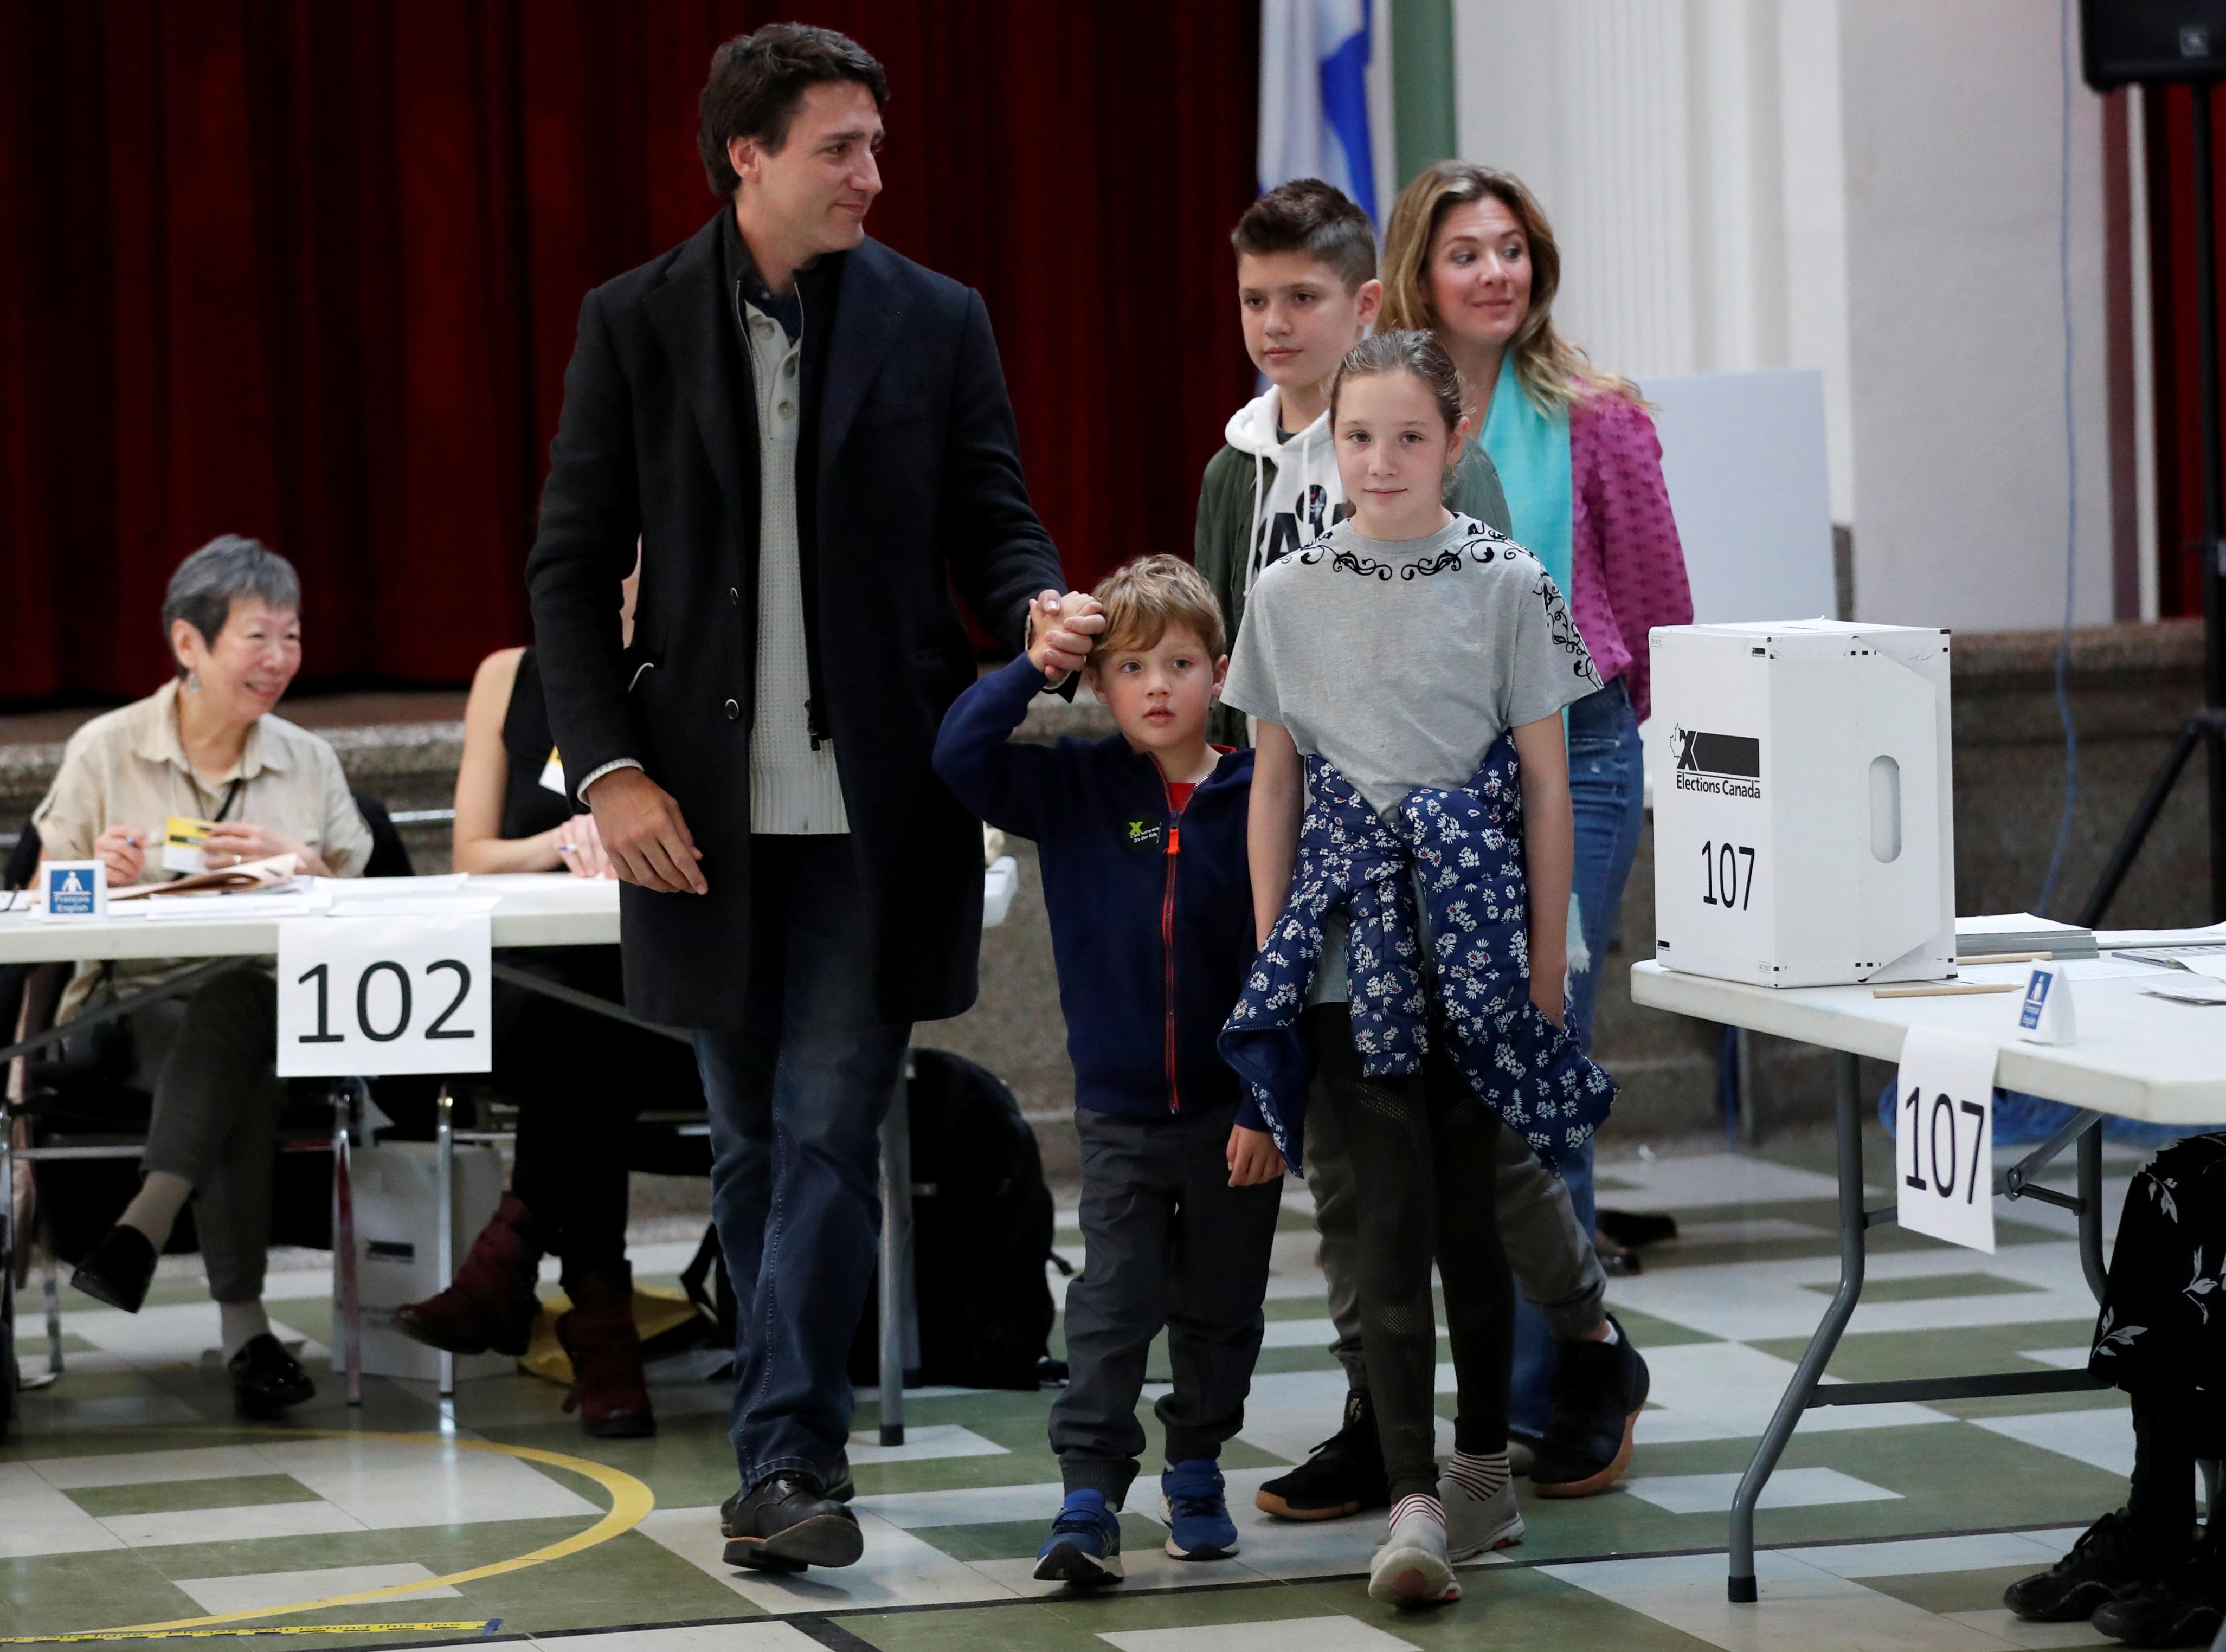 canada election - photo #29